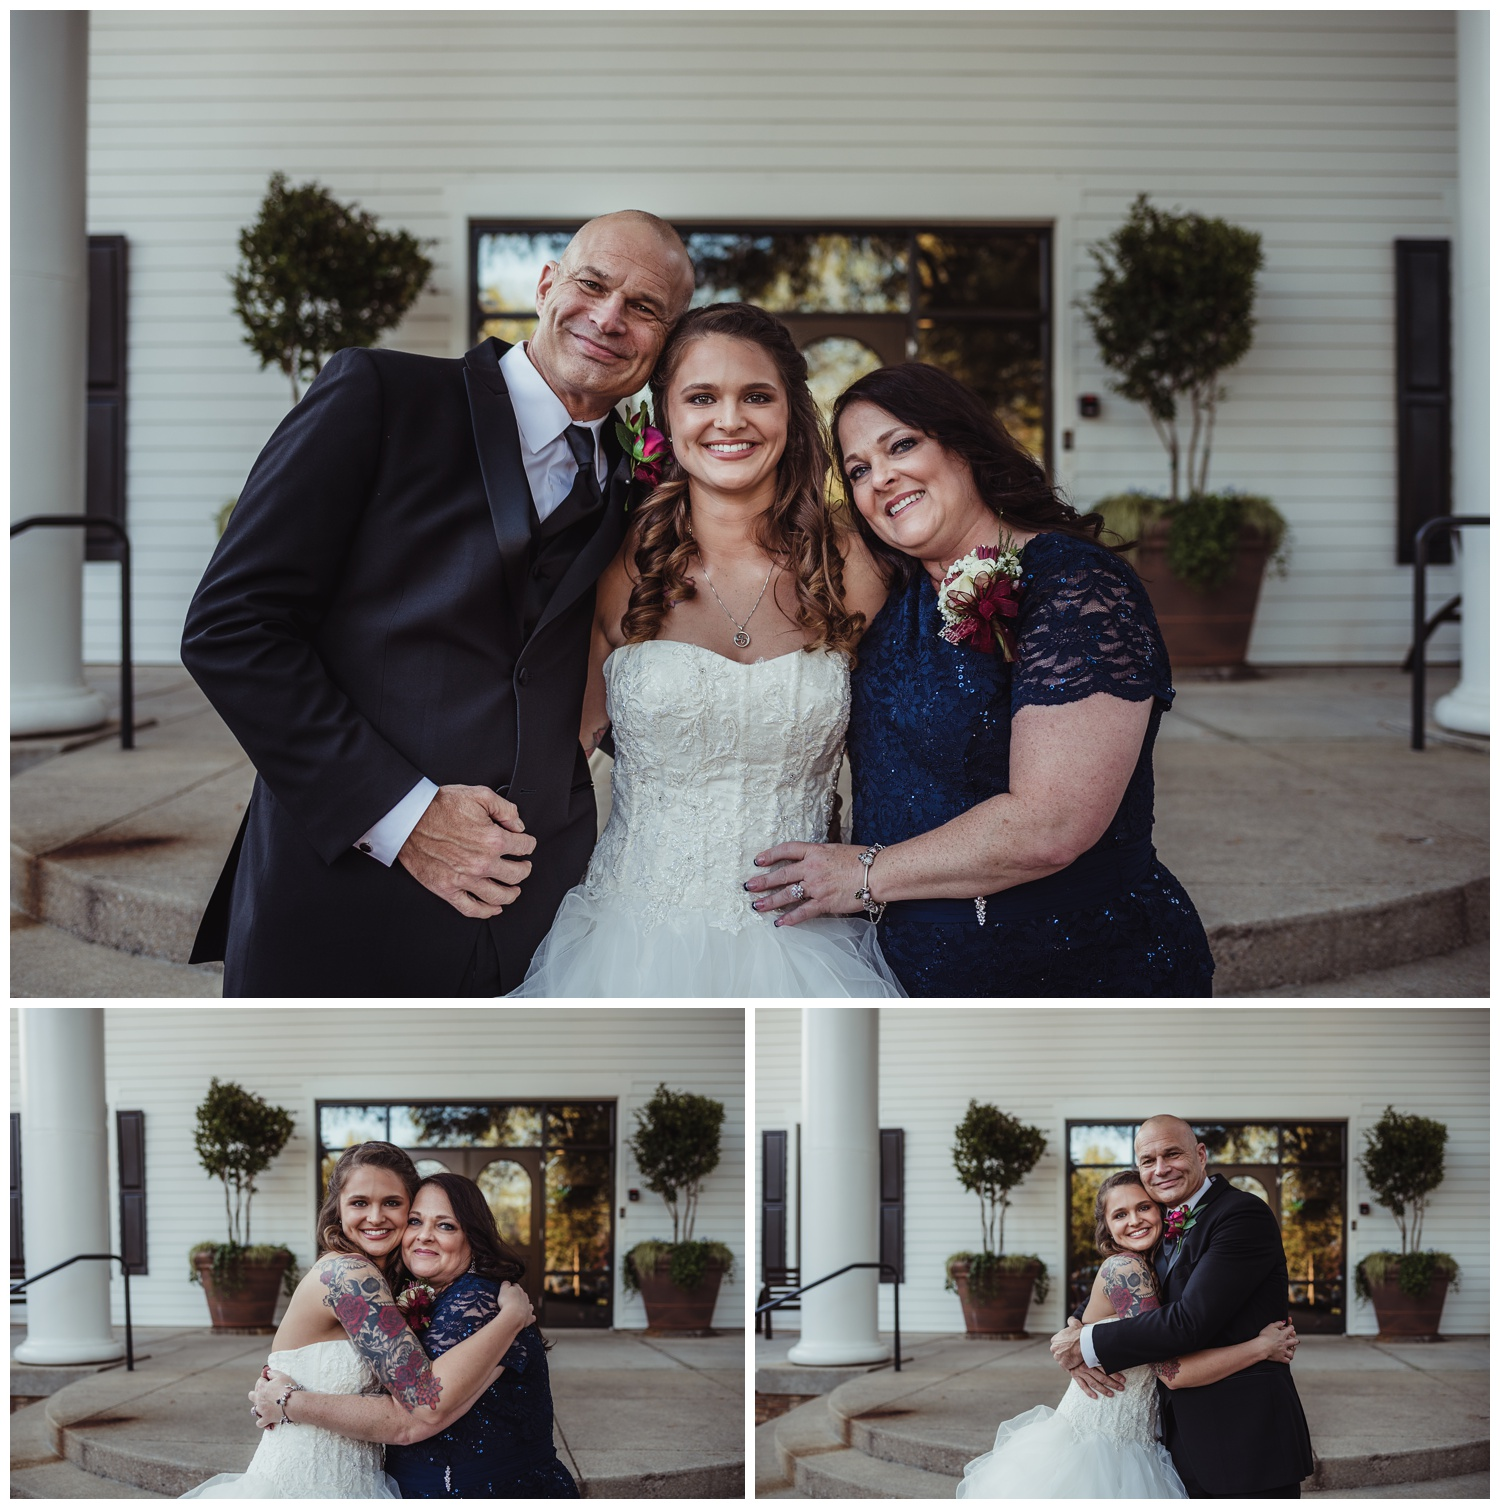 raleigh-wedding-photographer-portraits-1705-east-davids-bridal-caitlyn-and-evan_0005.jpg